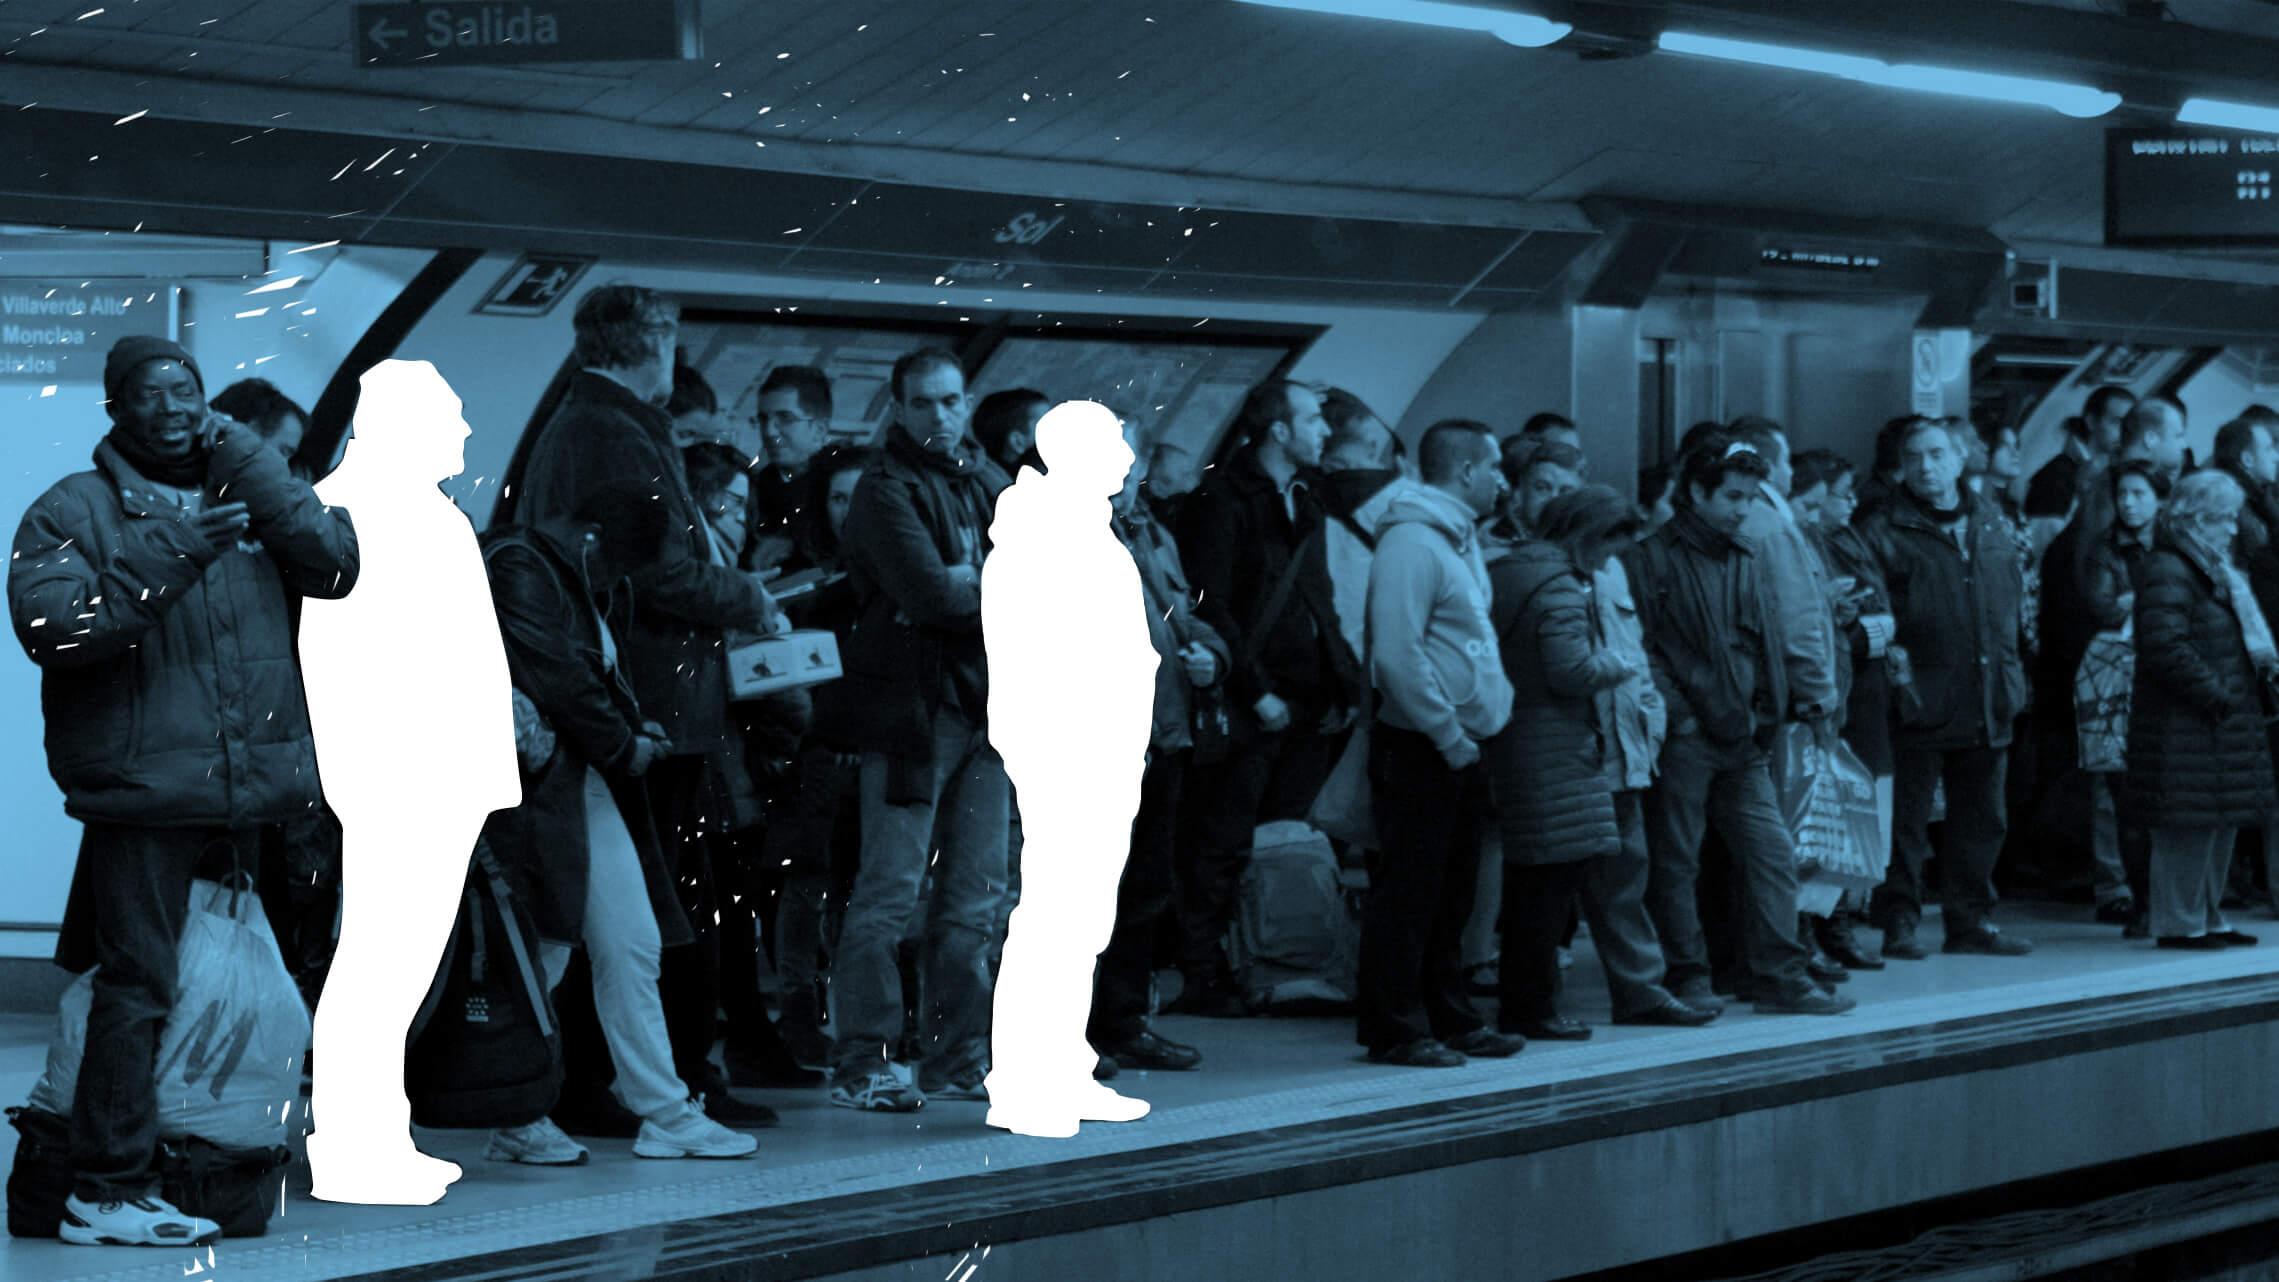 Personas desaparecidas: situación en España